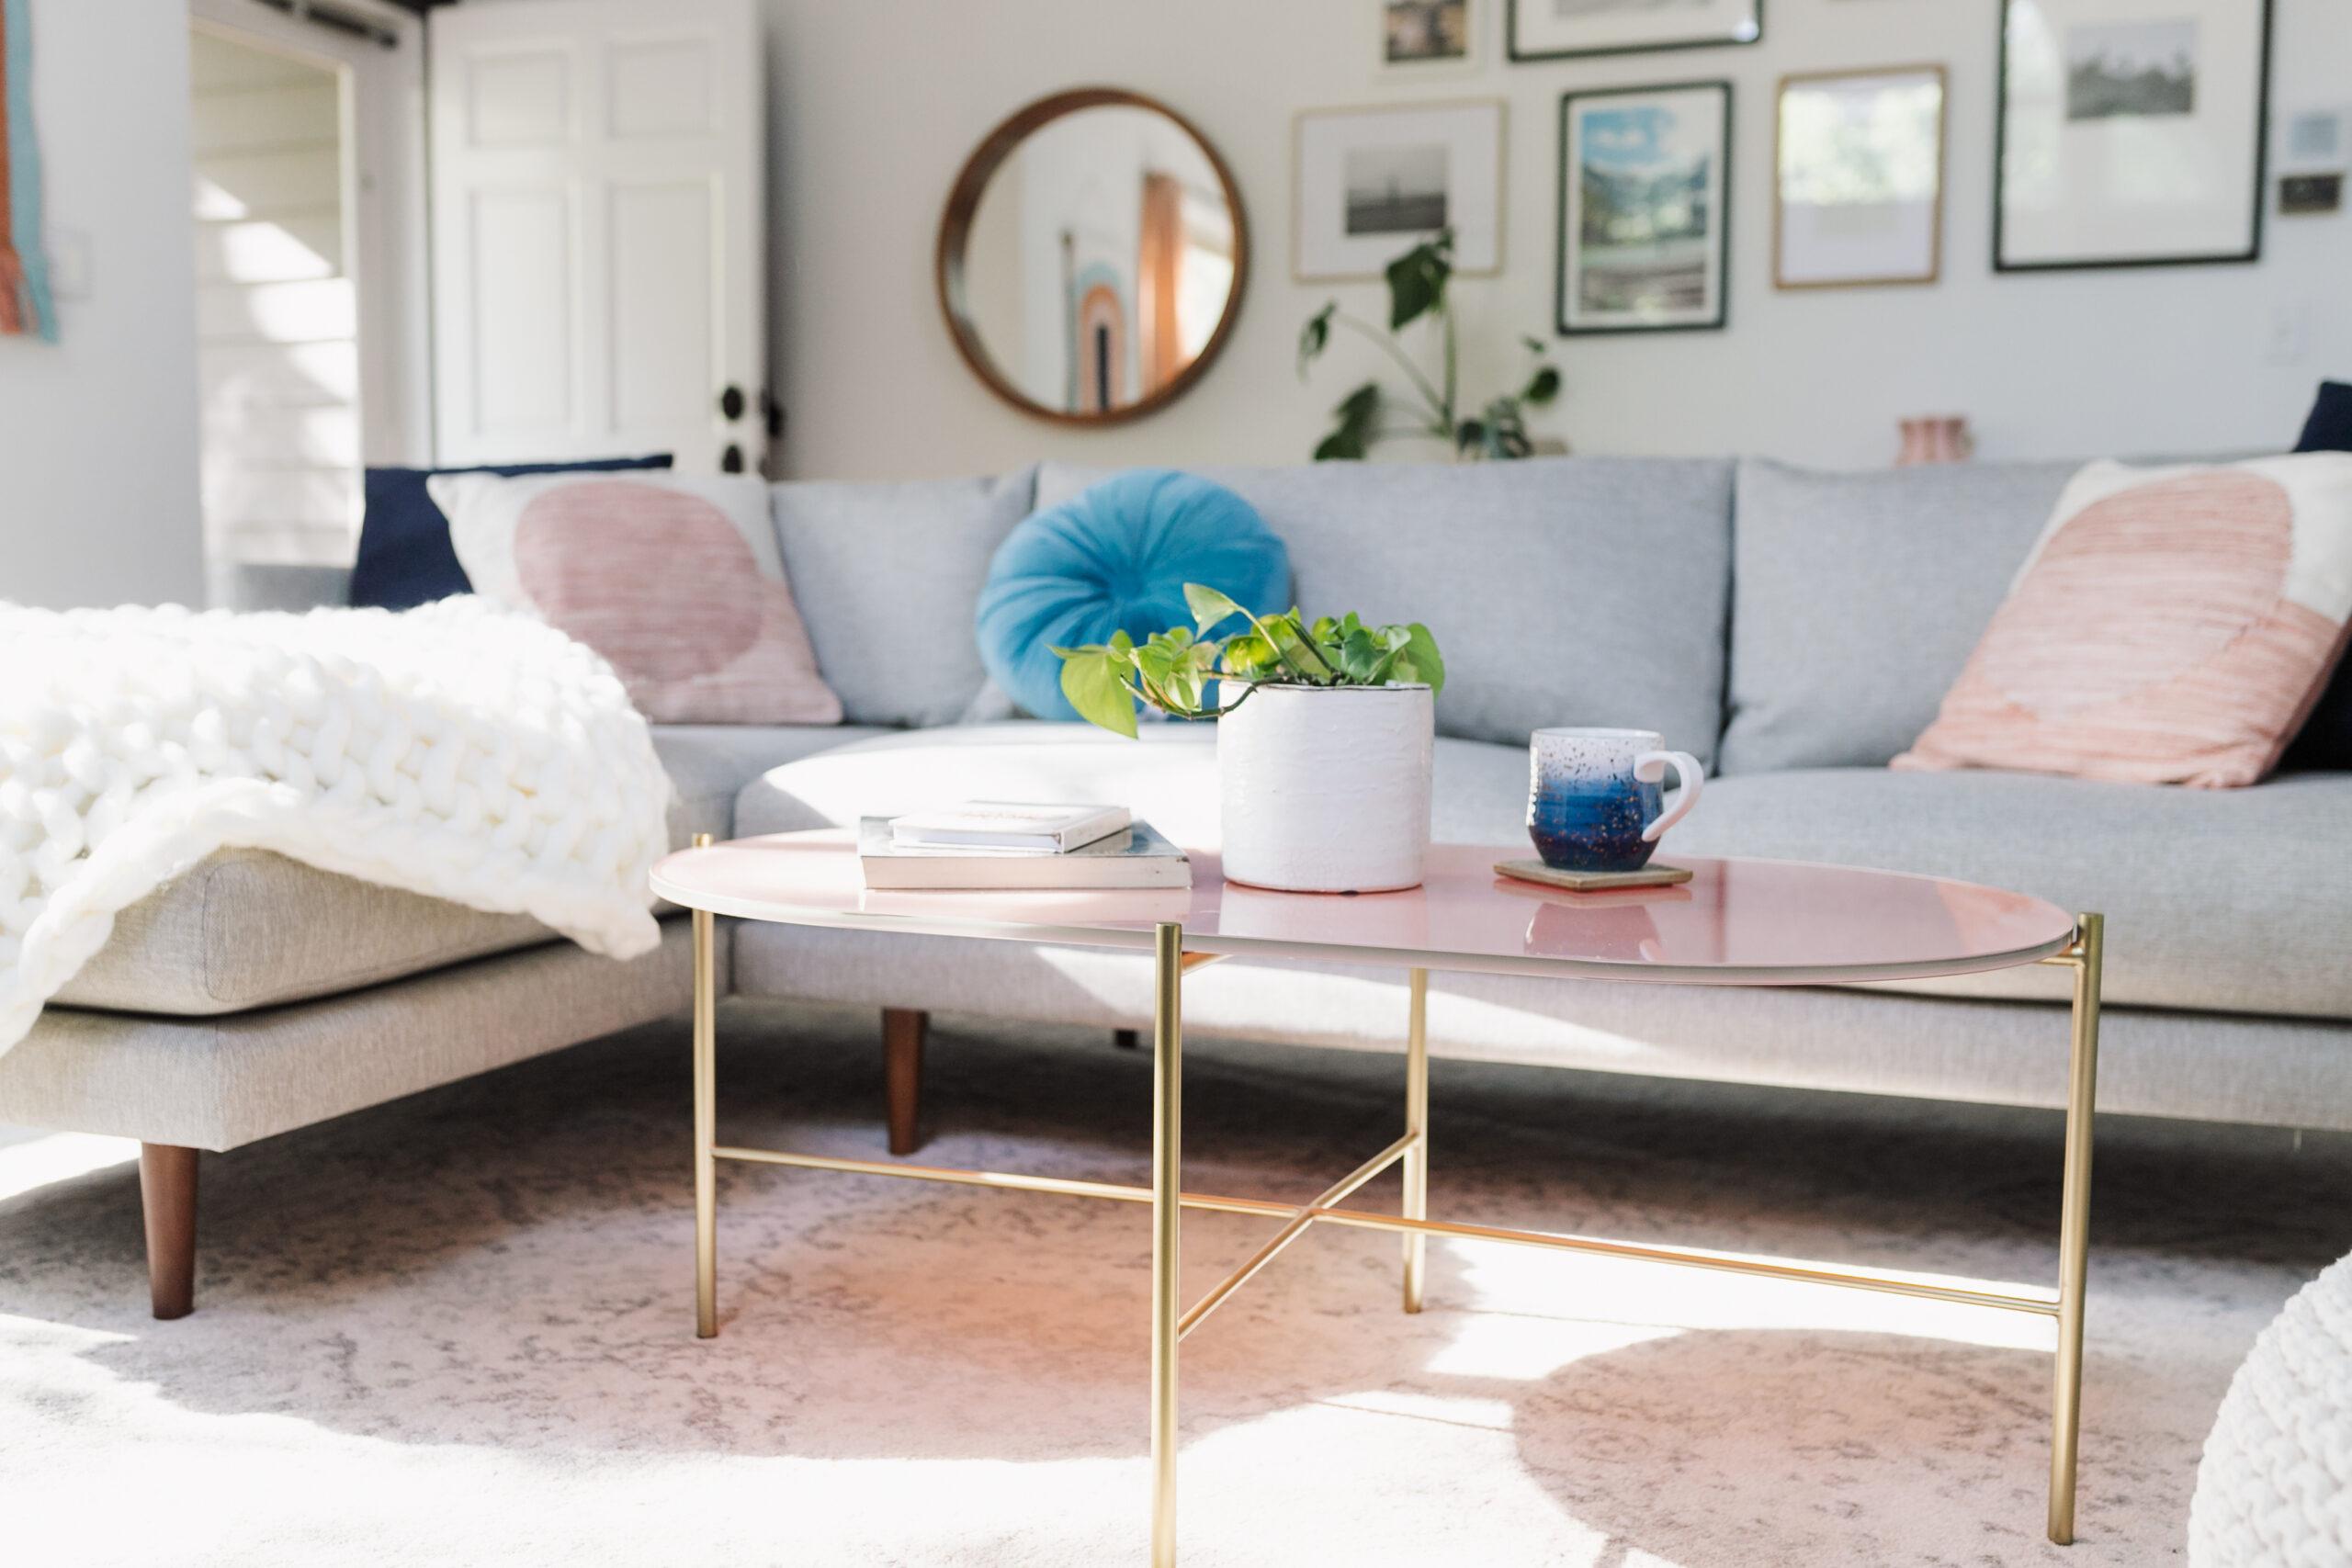 details on this space inside the modern mountain living room near aspen, colorado #aspenco #aspen #secondhome #mountainhome #modernlivingroom